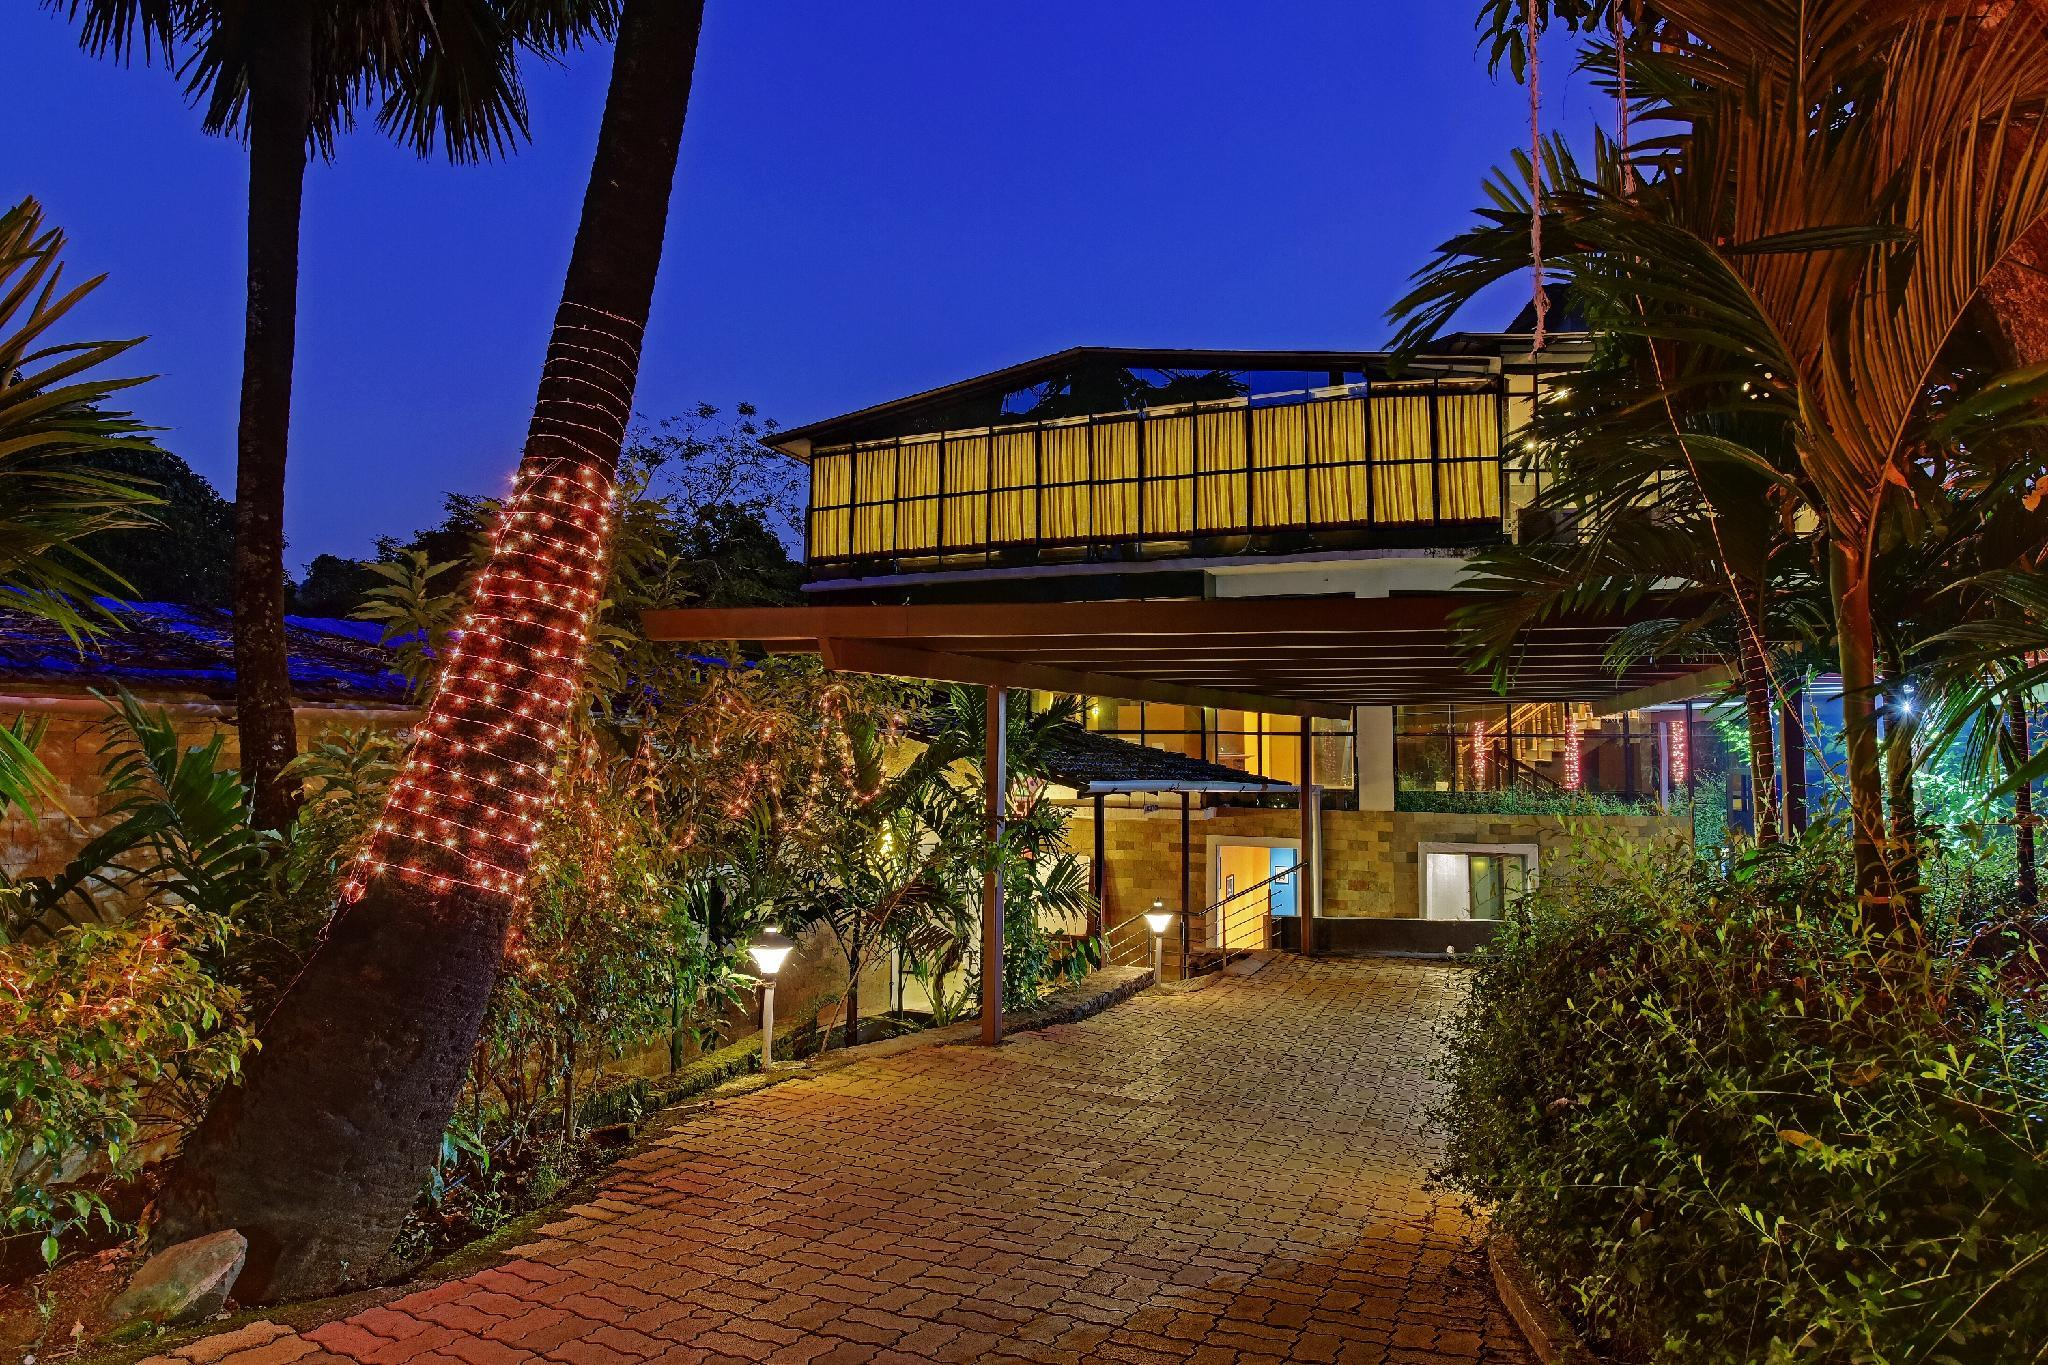 The Fern Silvanus Resort